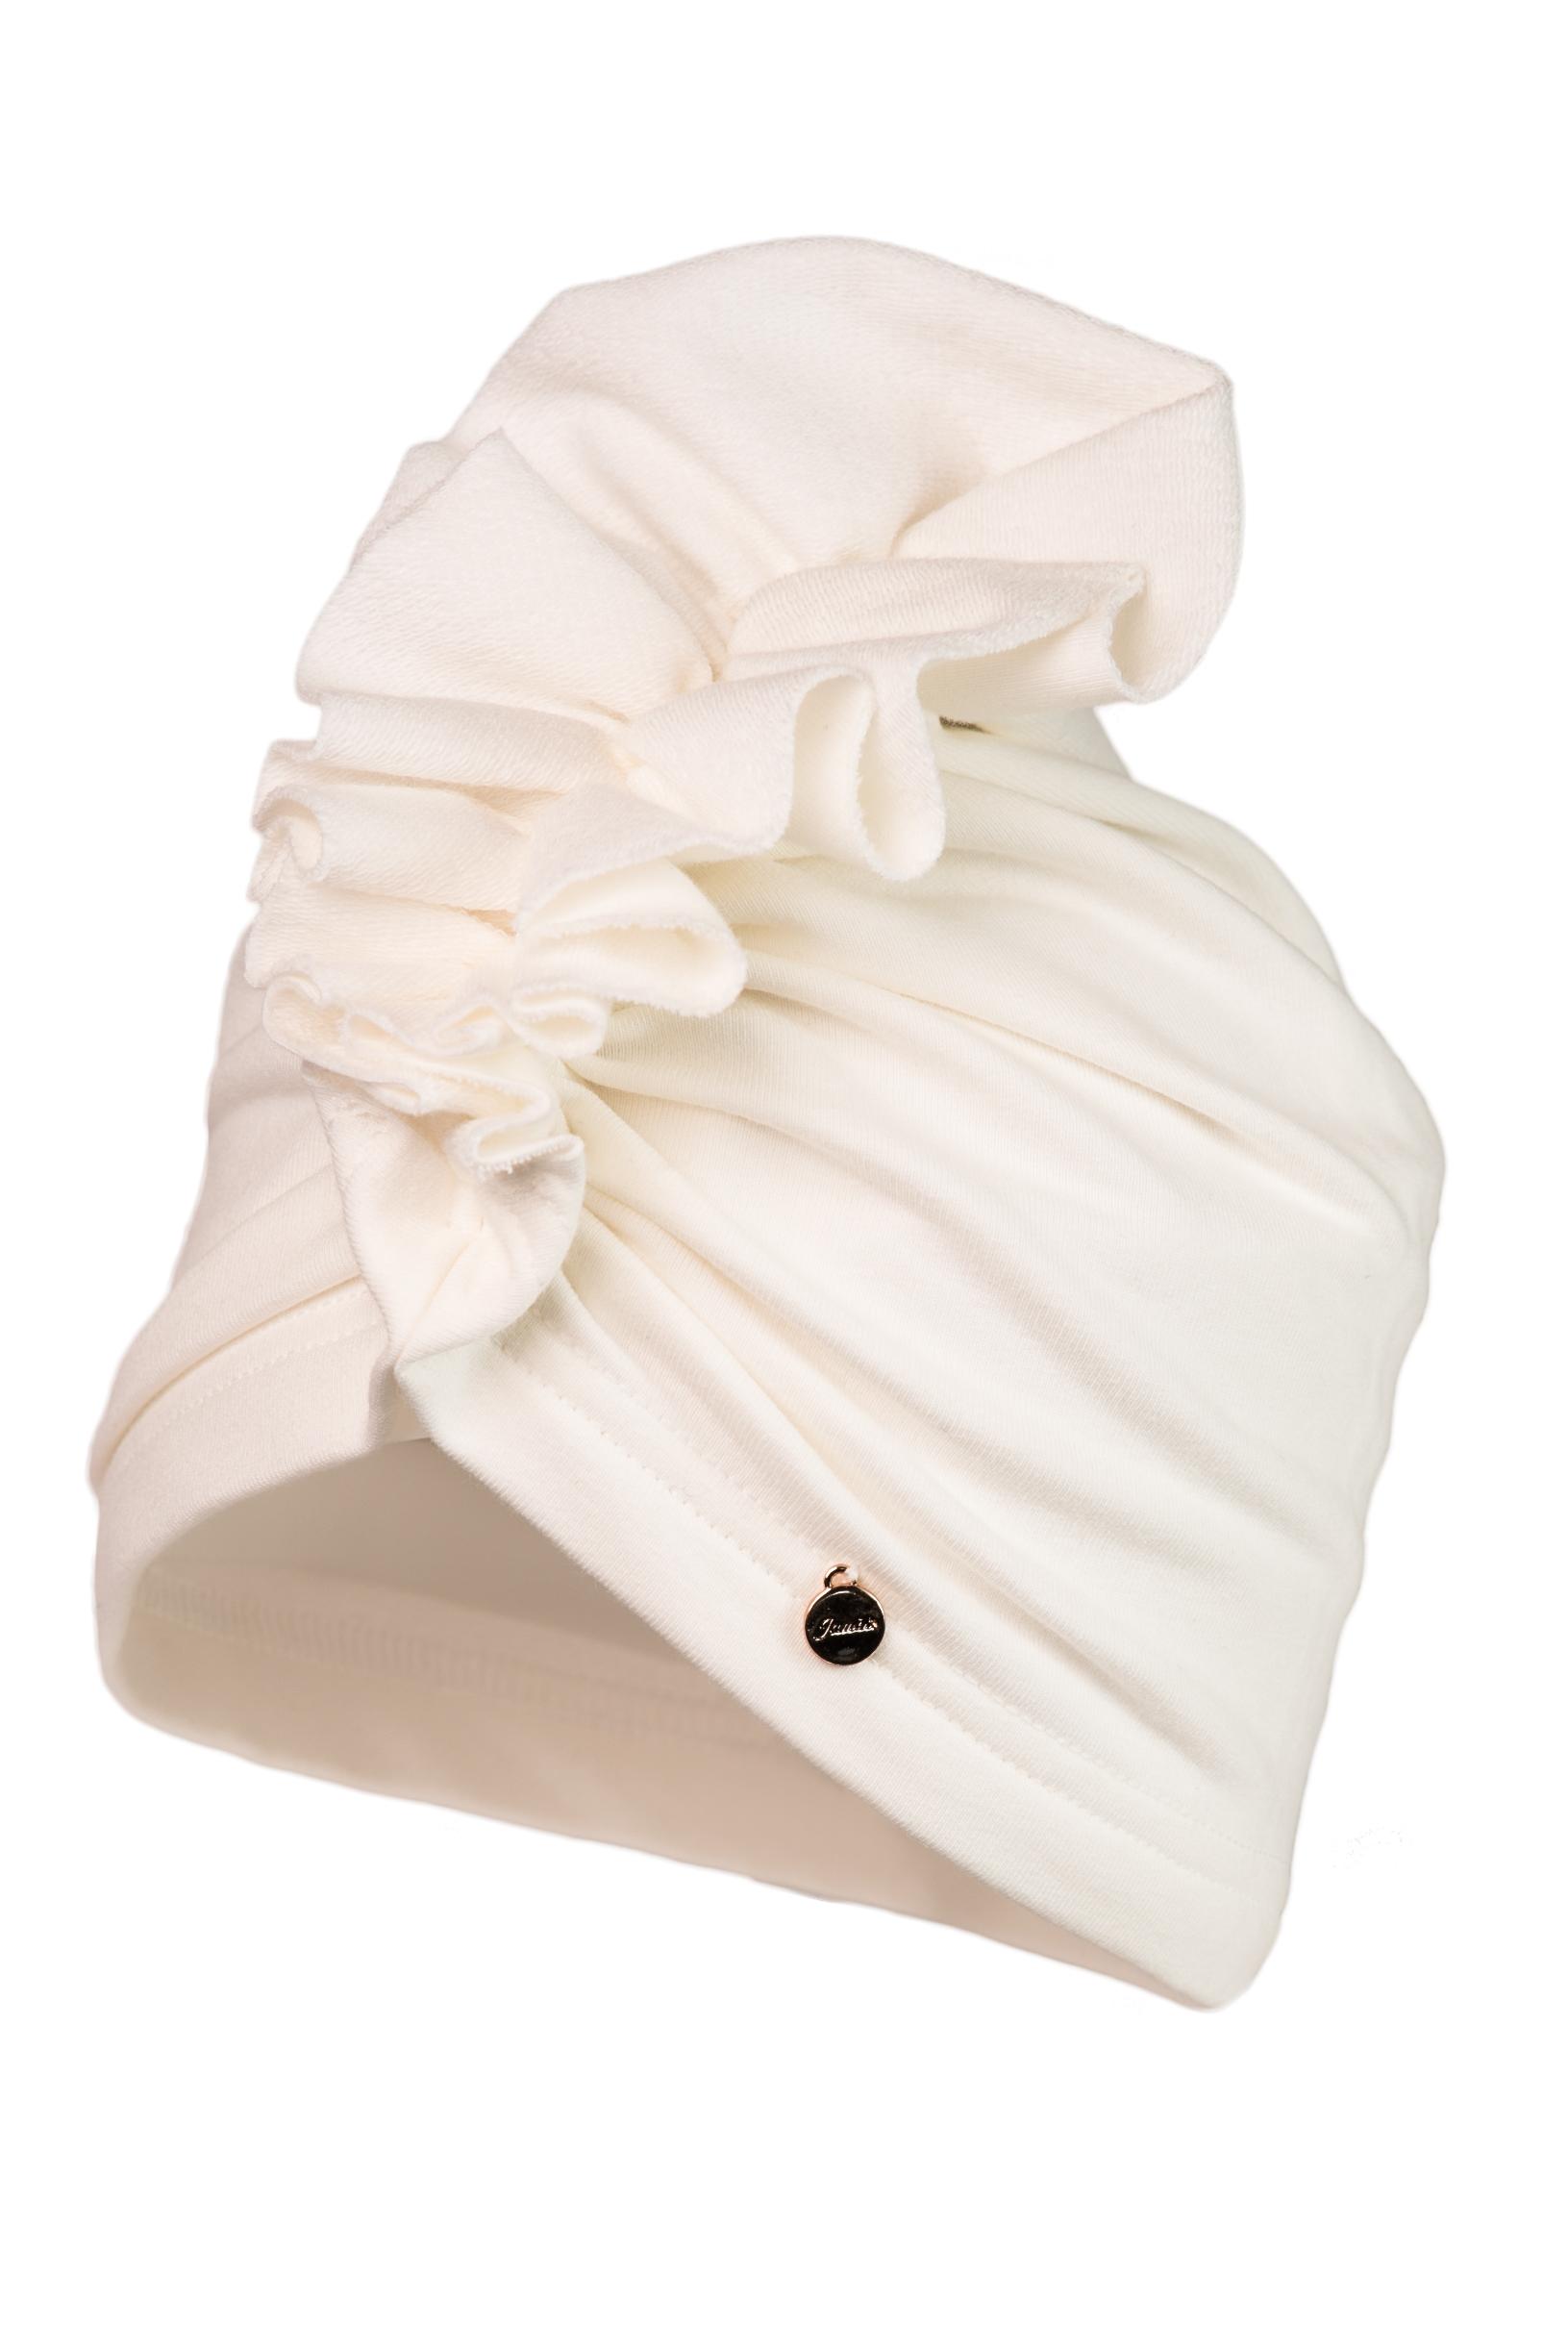 LANDONA turban 5